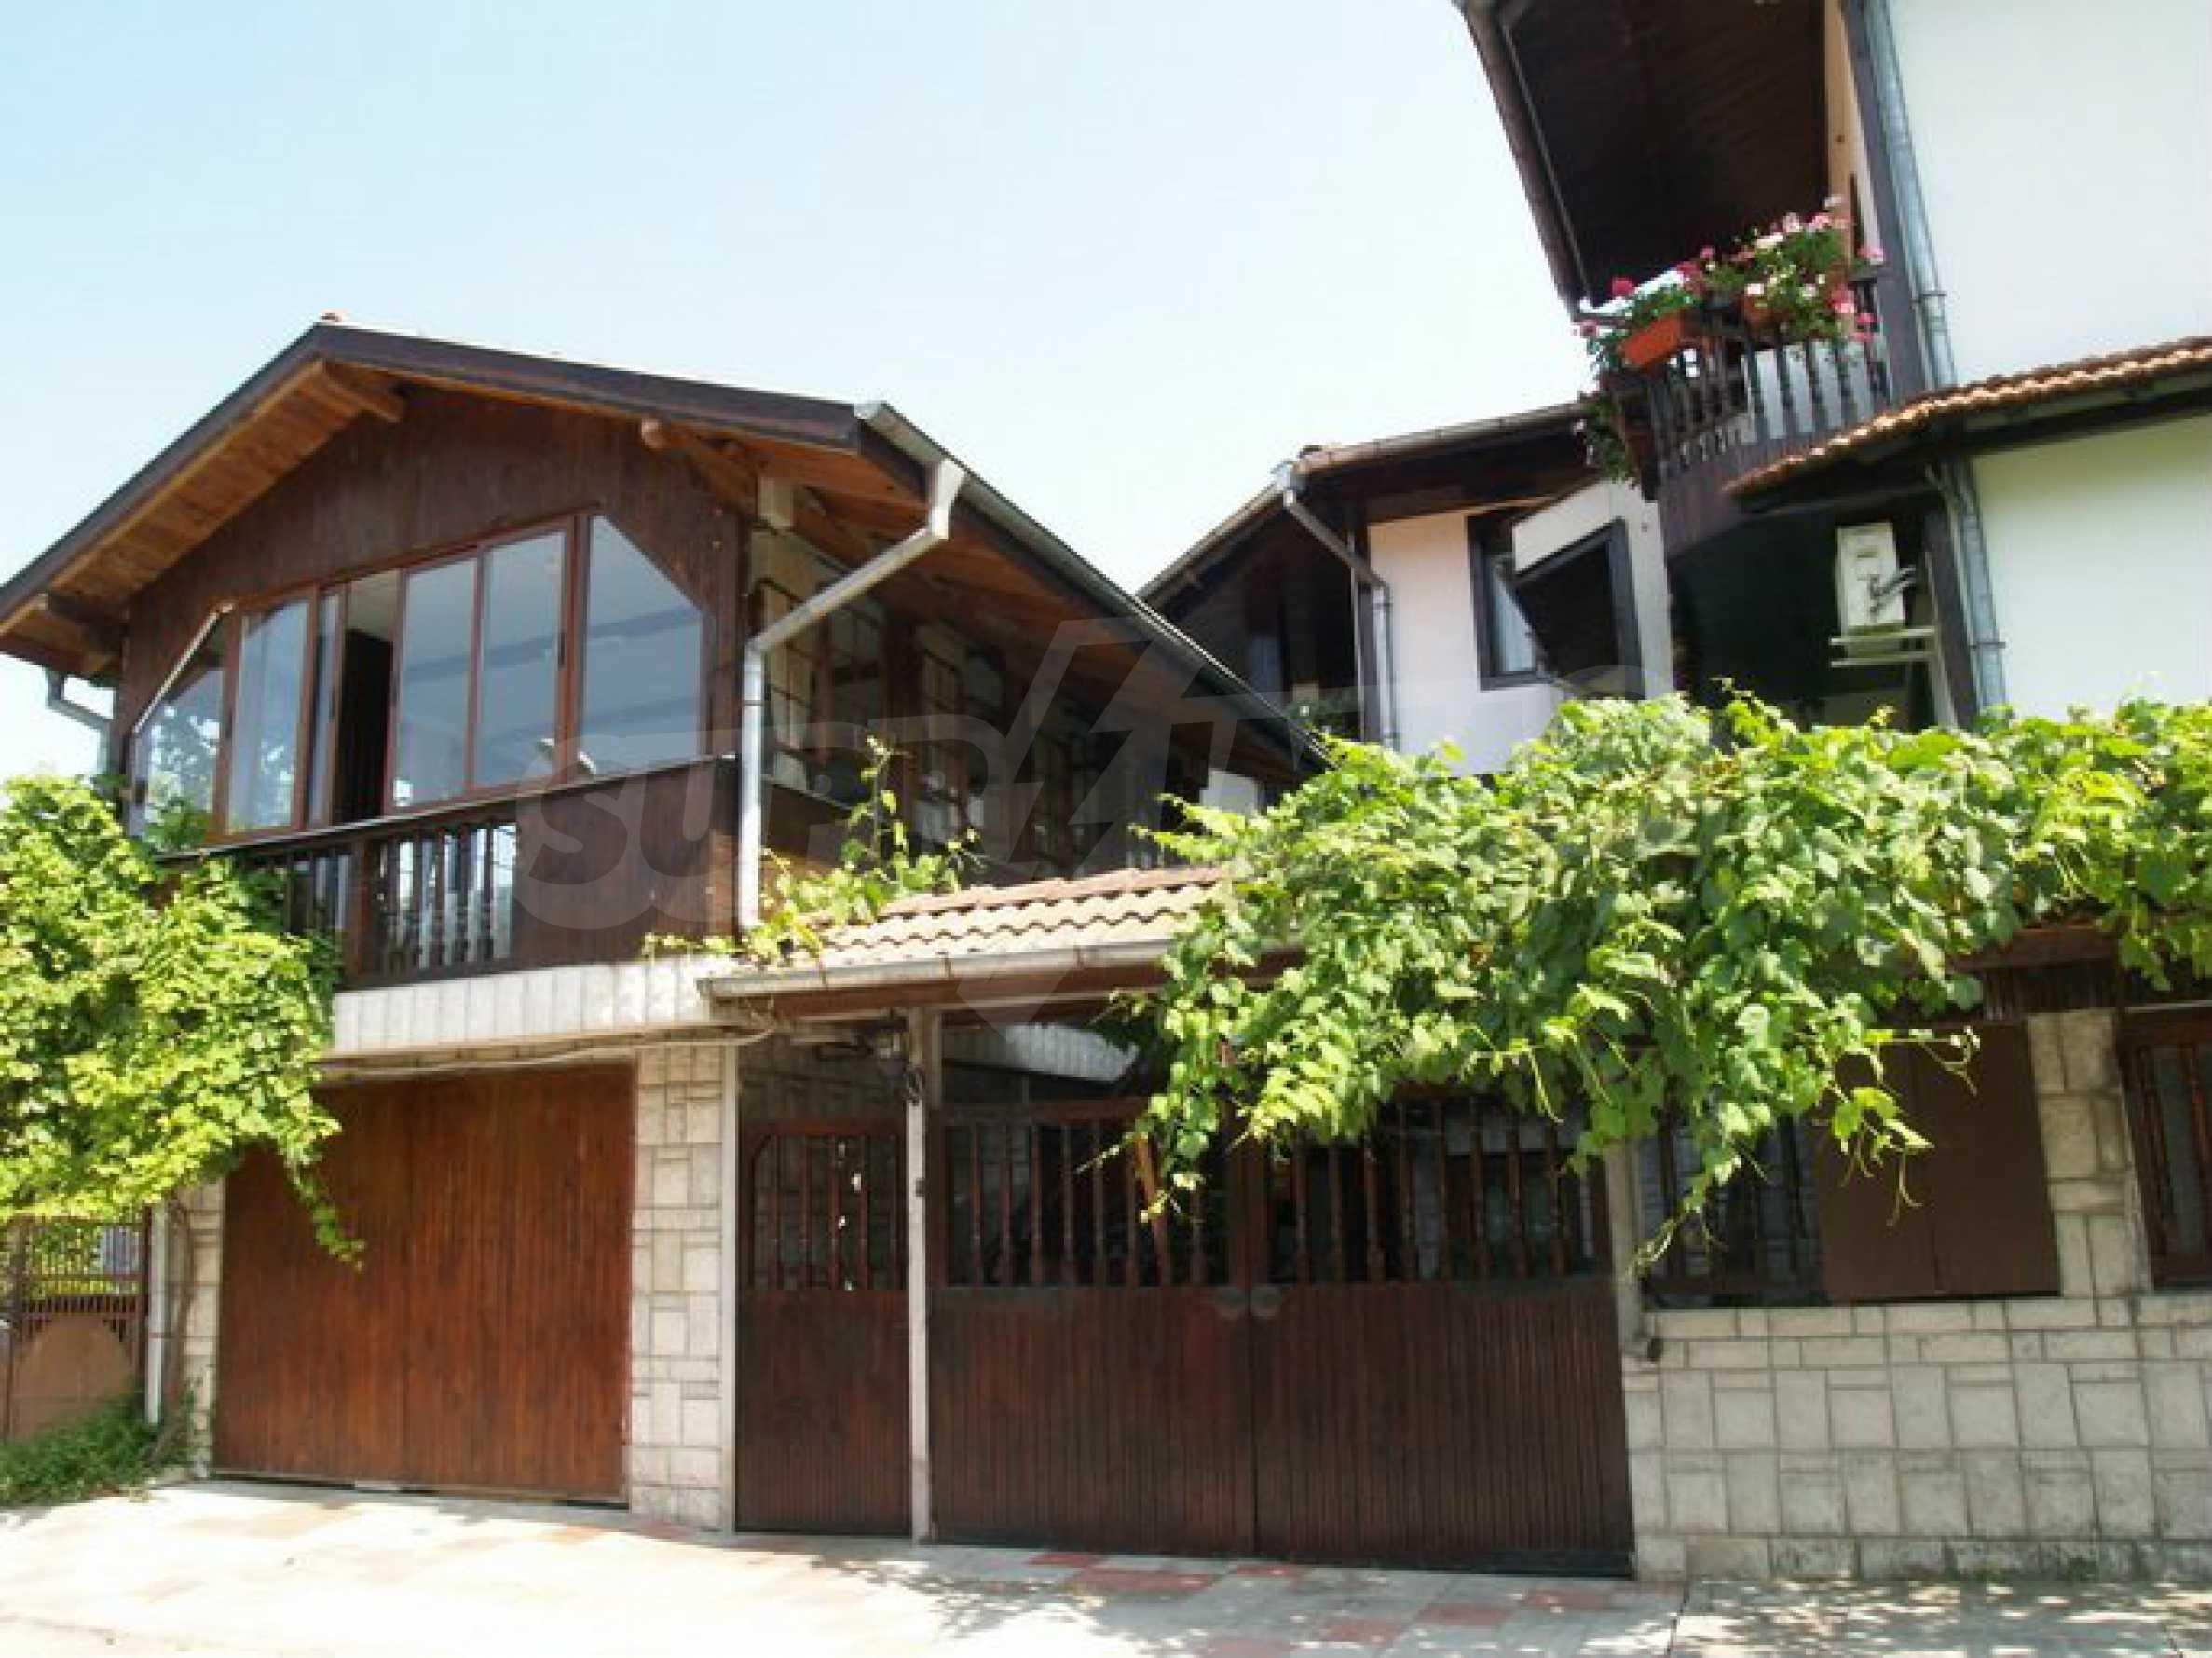 Hotelanlage mit Restaurant am Ufer des Flusses Osam in Lovech 4